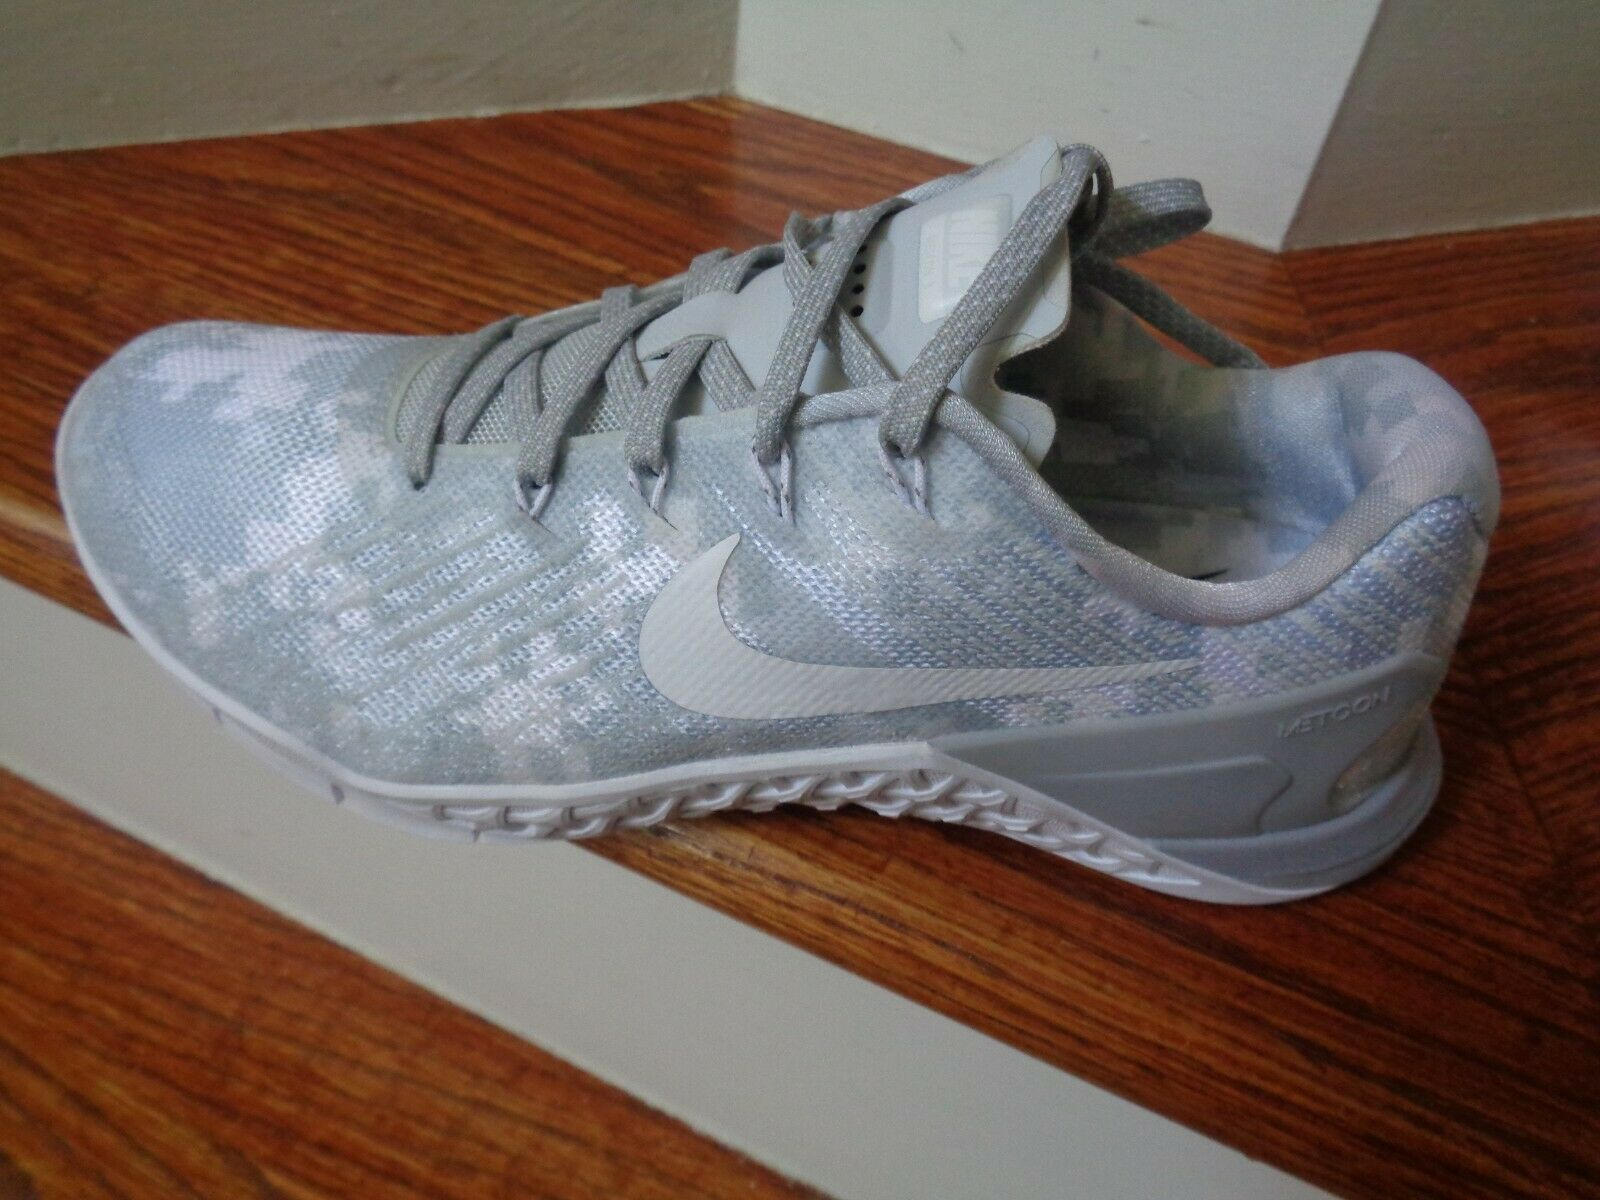 WMNS Nike Nike Nike METCON 3 AMP kvinnor Training springaning skor, 849808 002 Storlek 8 ny  skyndade sig att se